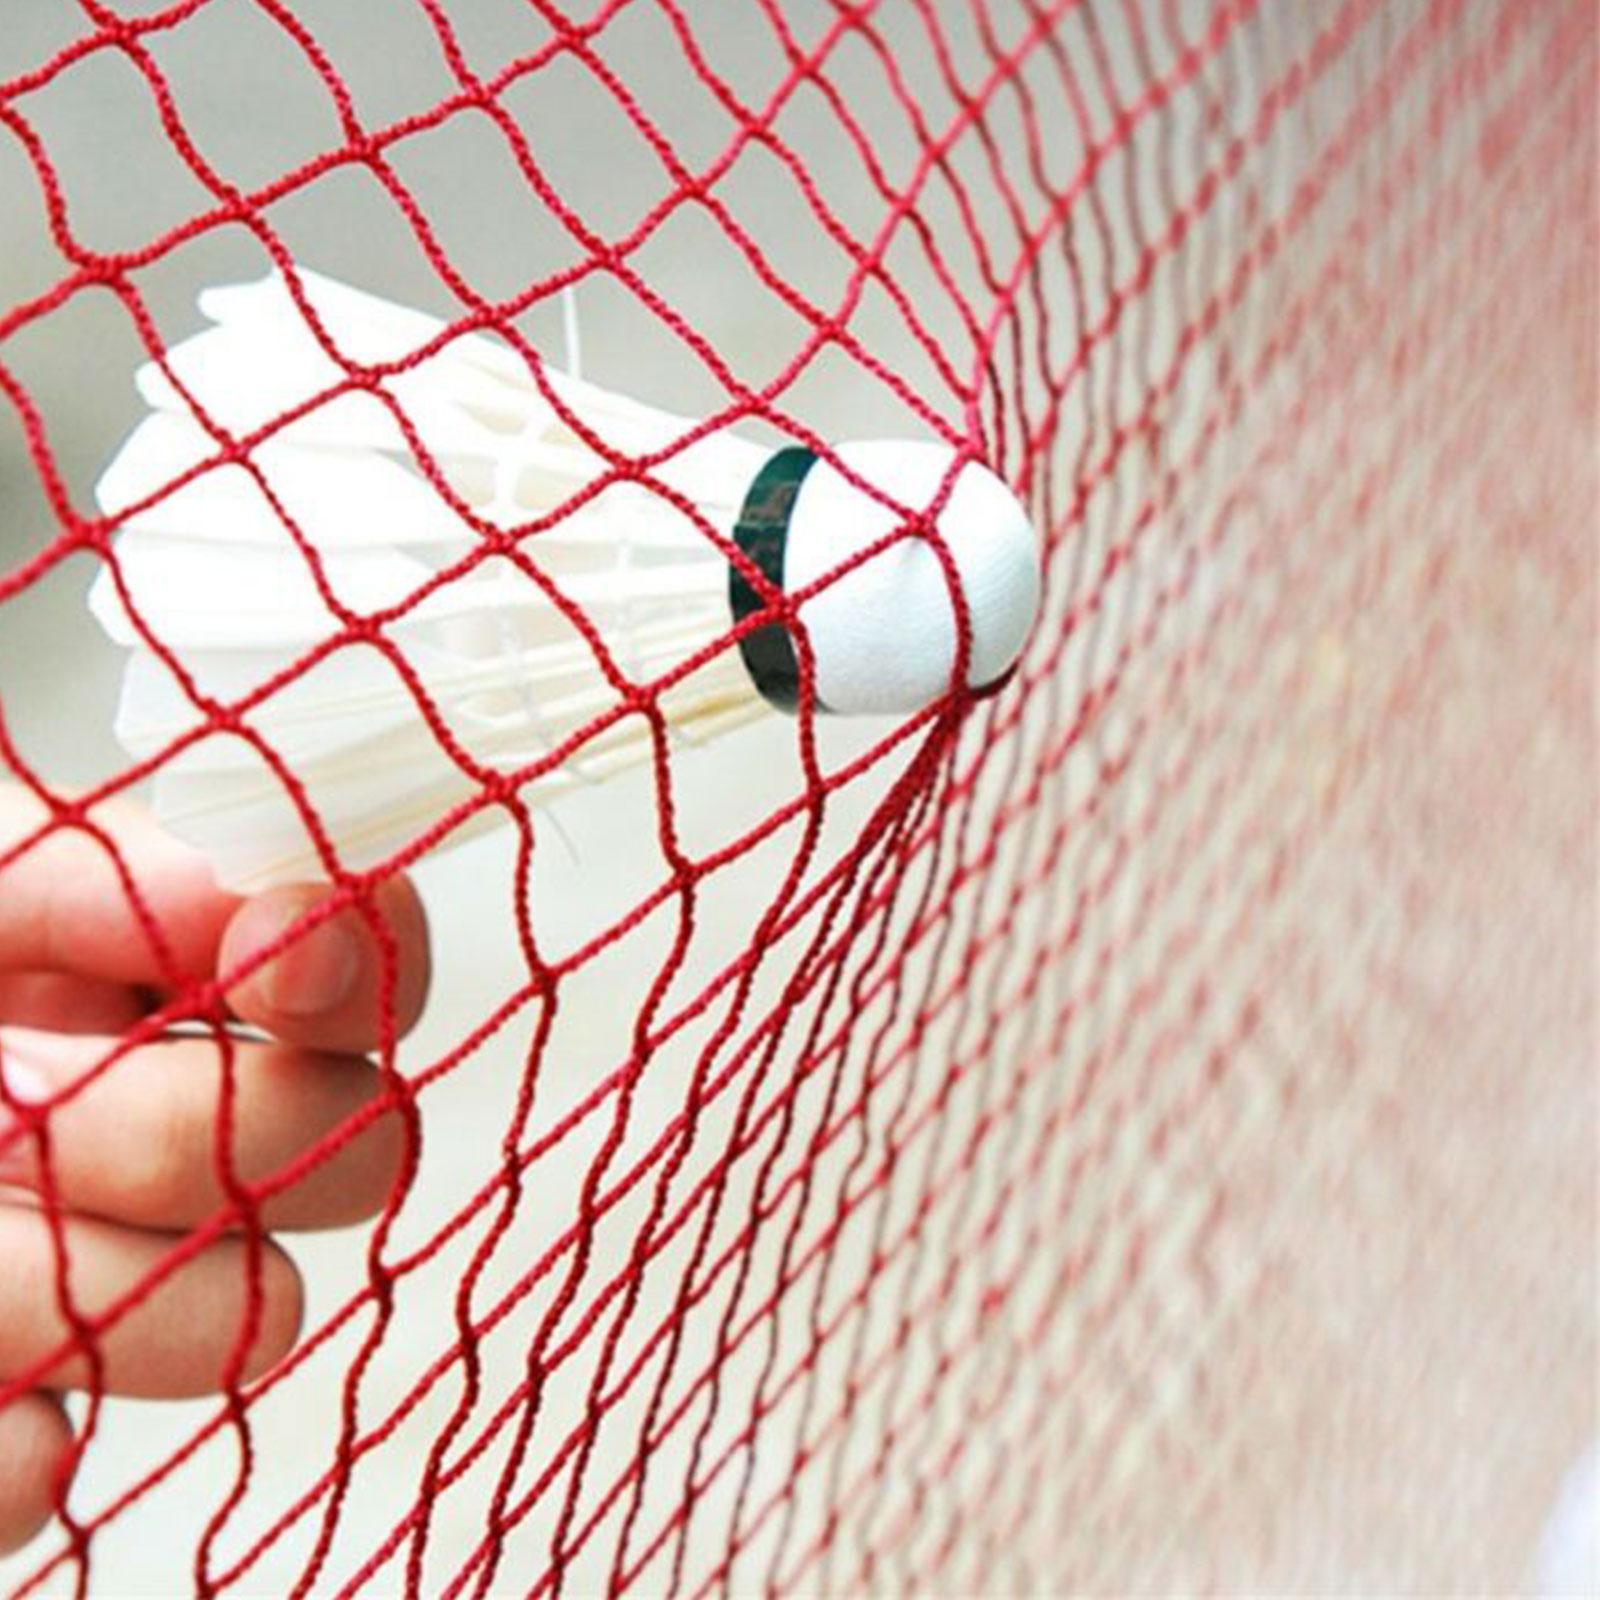 Red-Badminton-Tennis-Volleyball-Net-For-Beach-Garden-Indoor-Outdoor-Games-Sport thumbnail 11